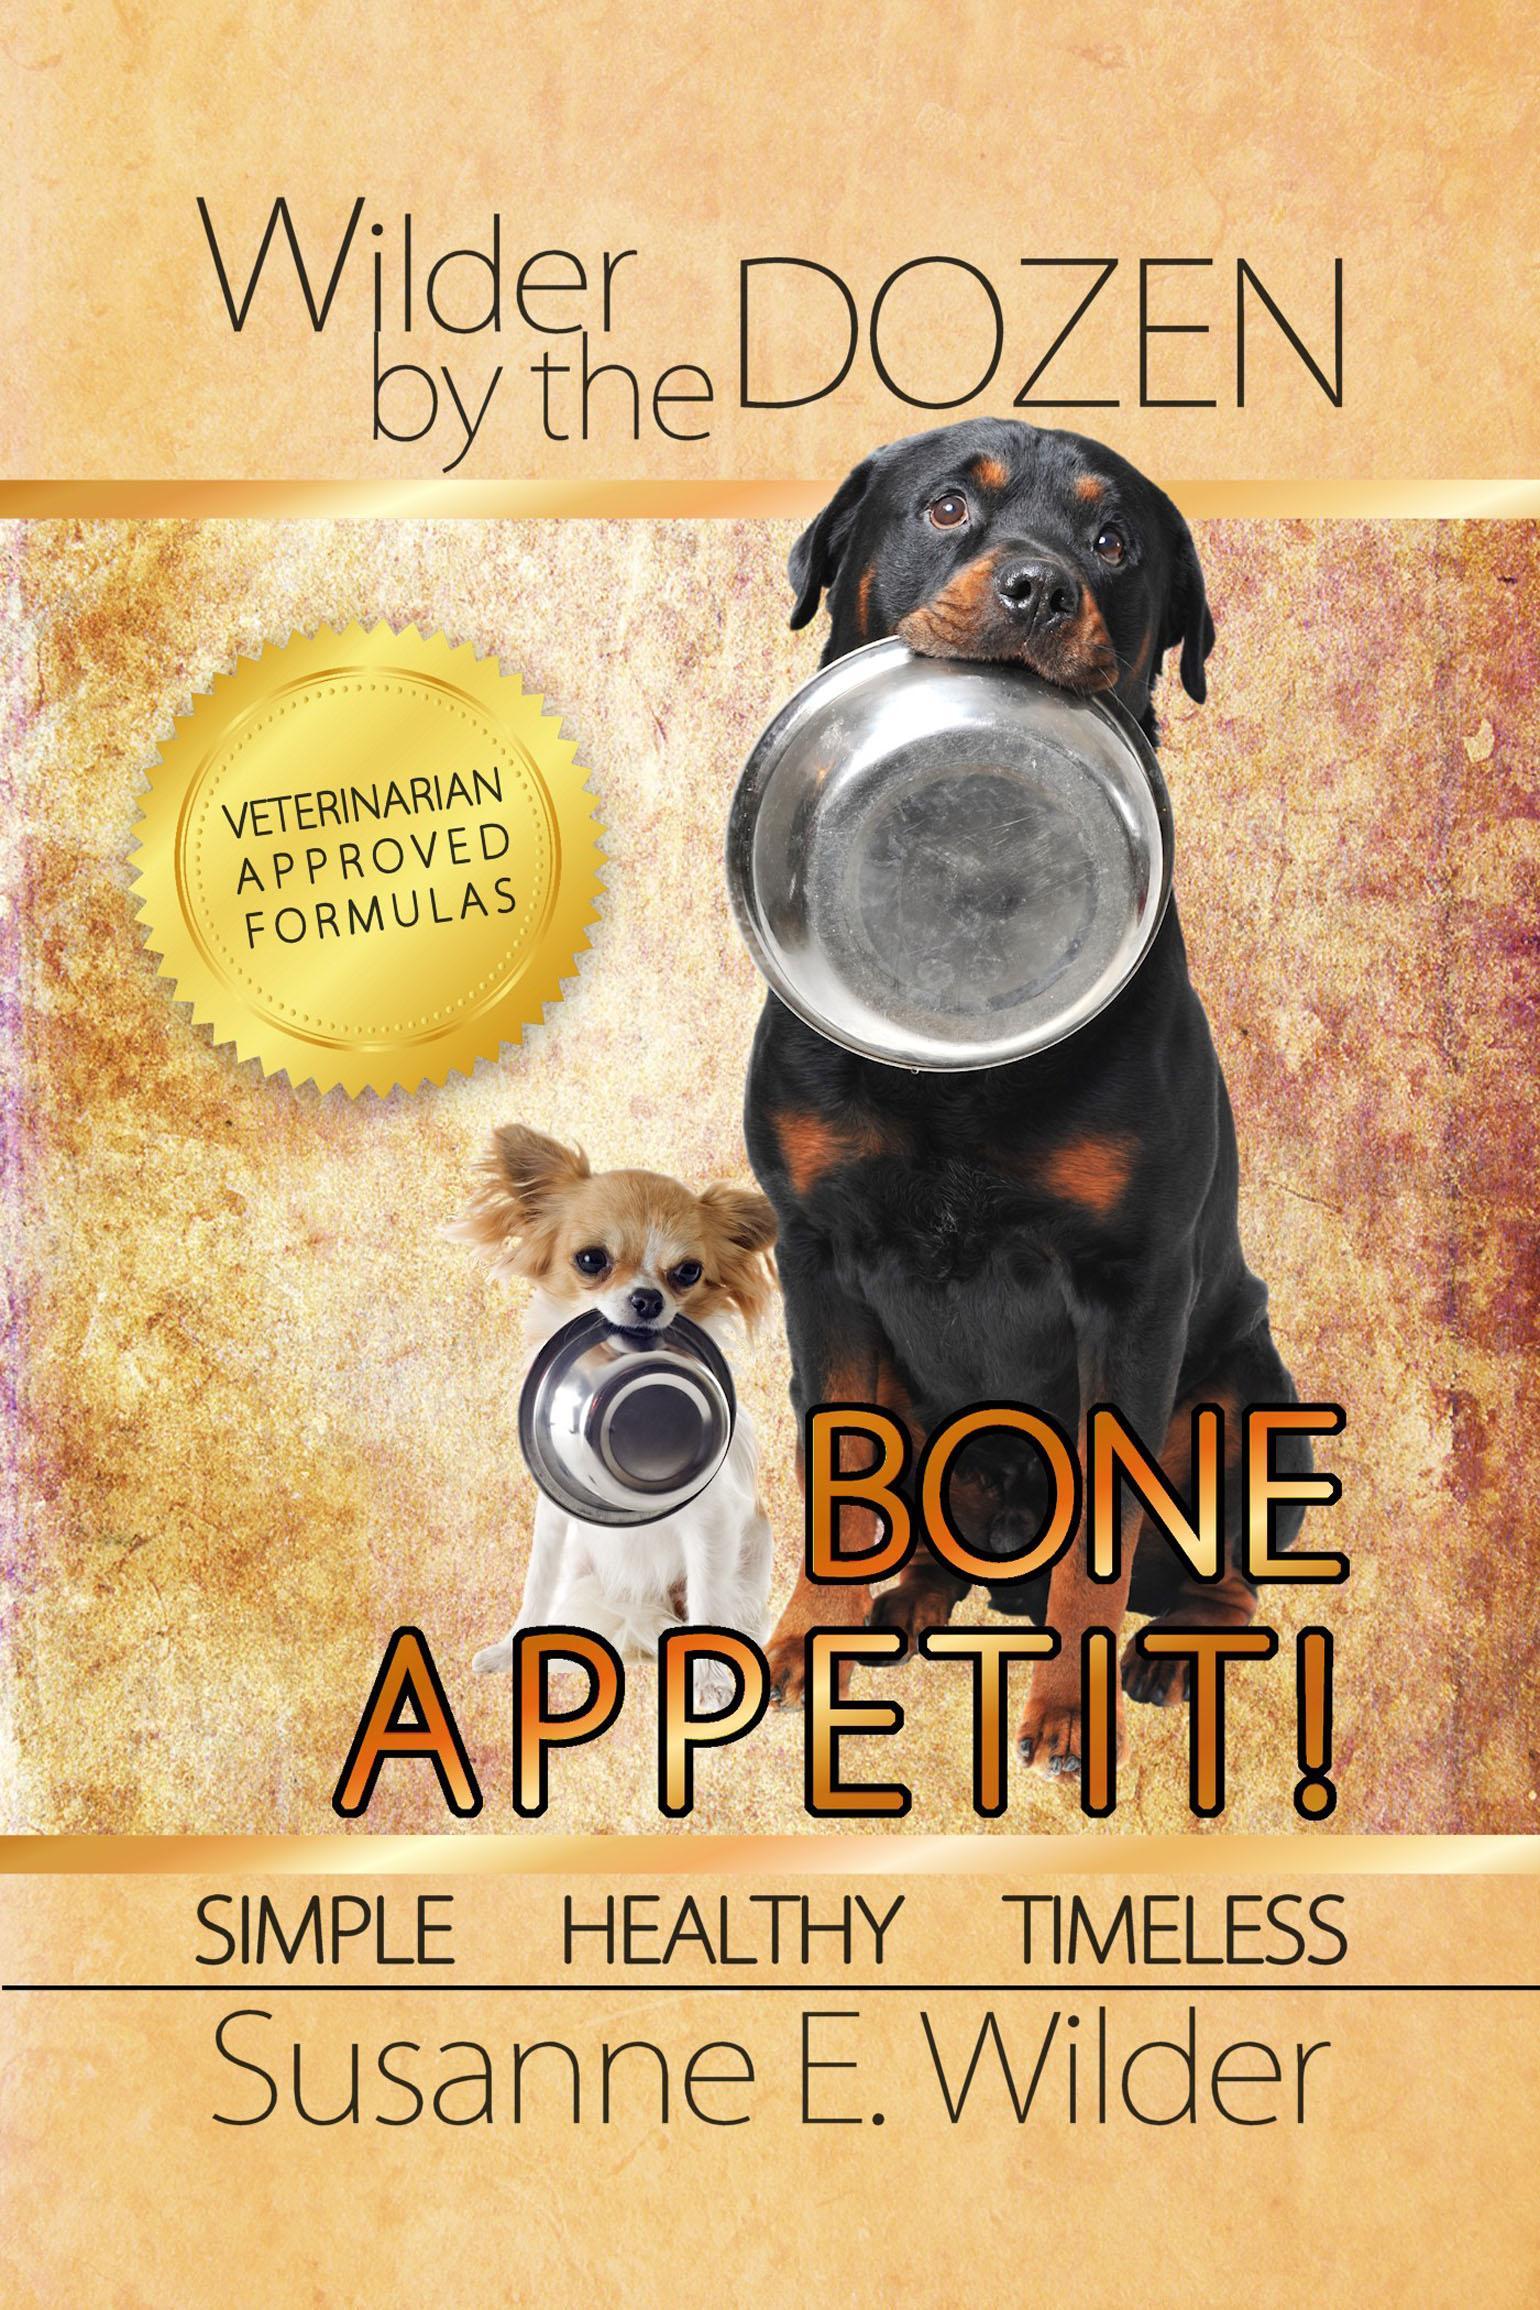 Bone Appetit!